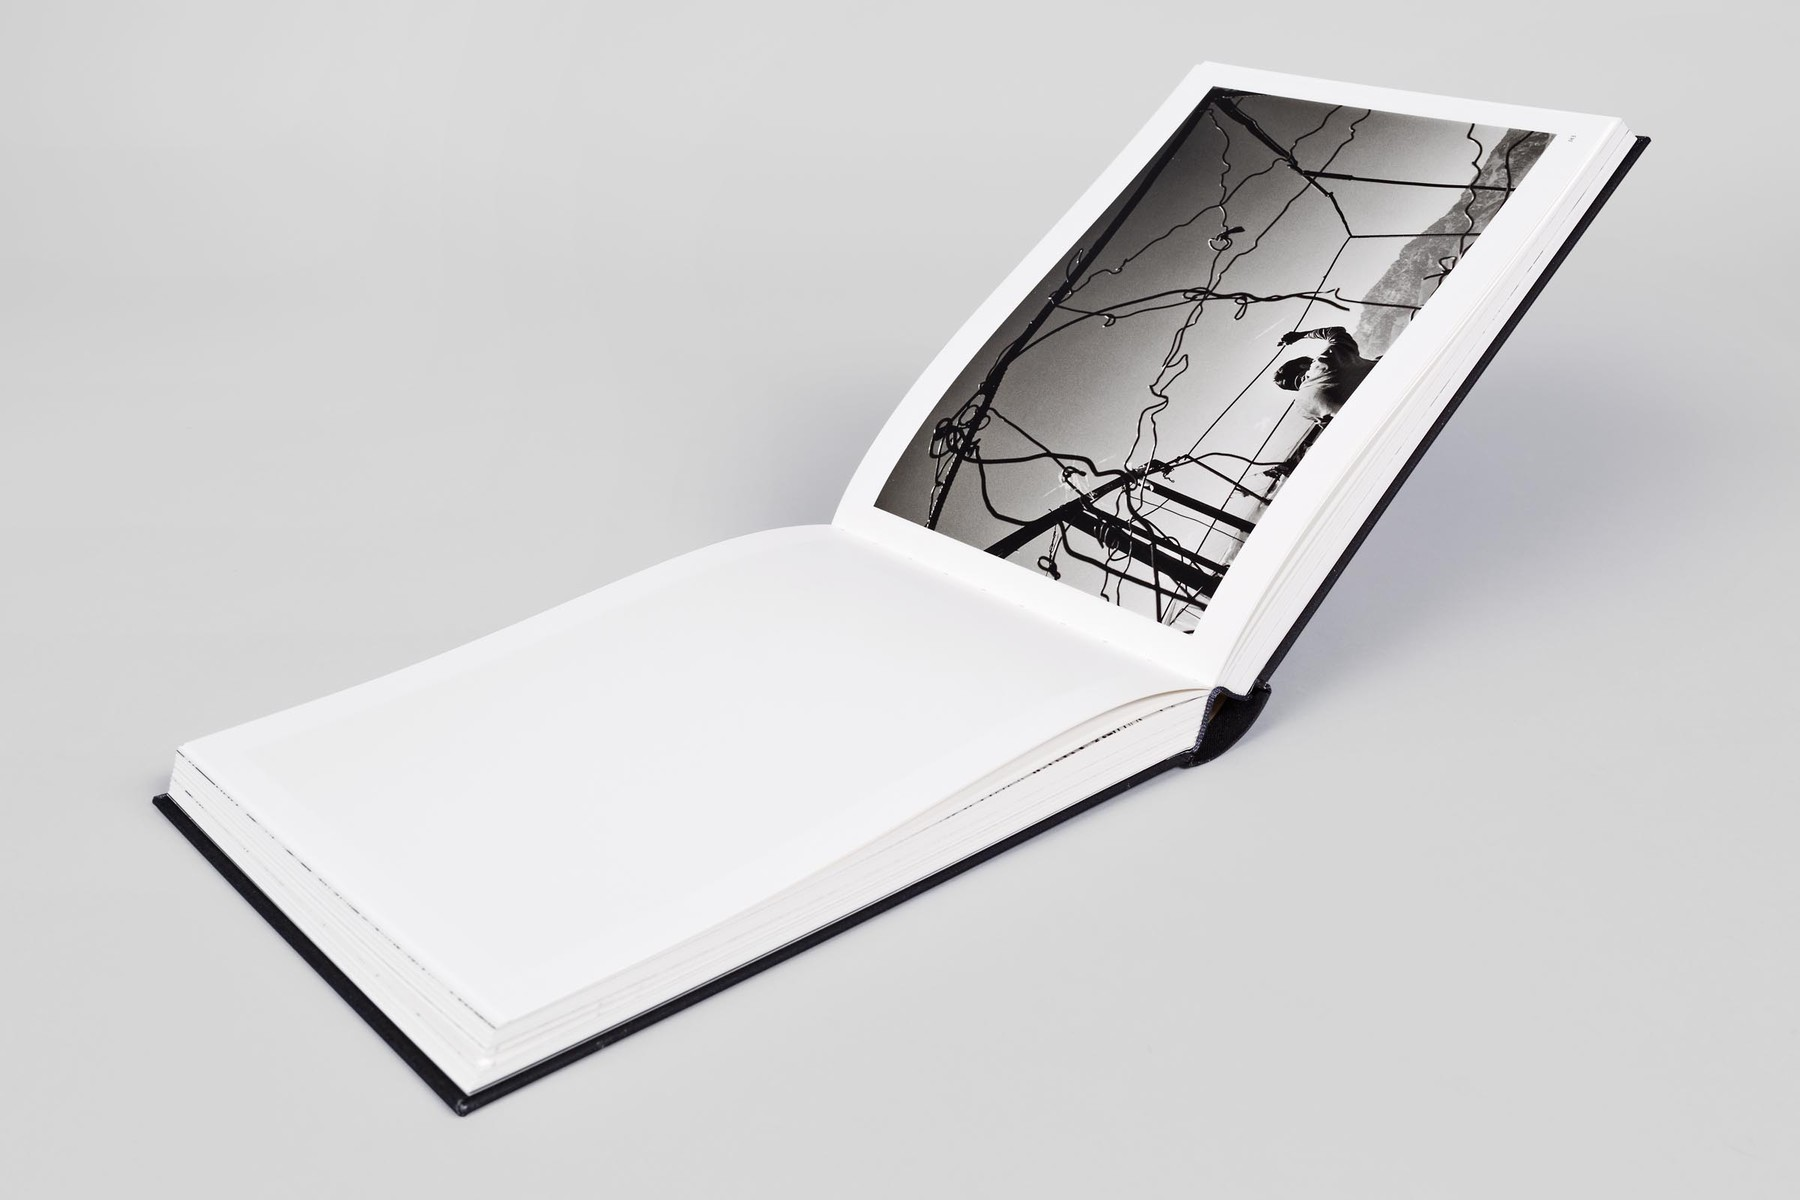 ivan-sigal-white-road-corcoran-gallery-of-art-004